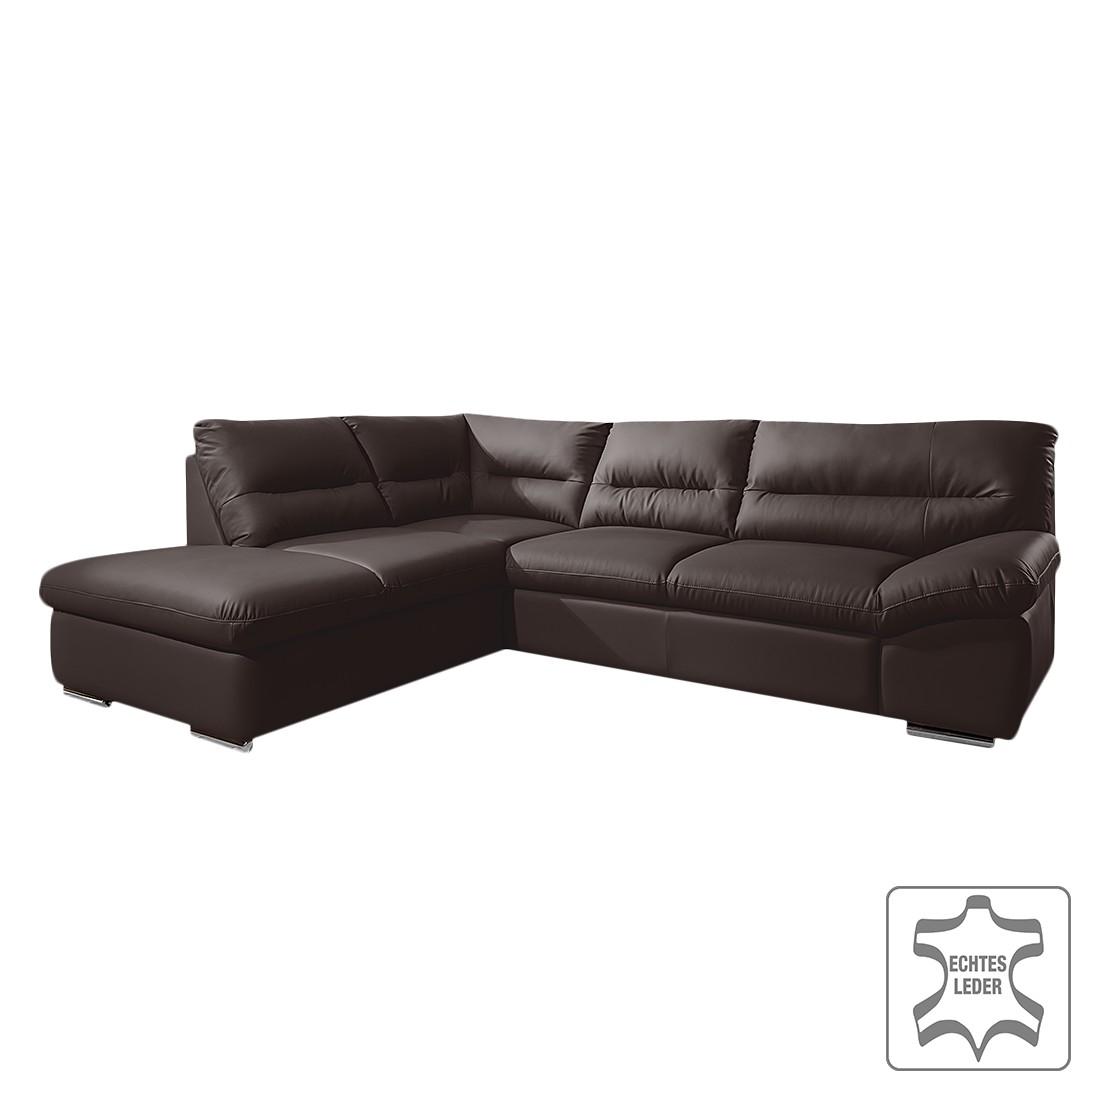 ecksofa doug mit schlaffunktion echtleder dunkelbraun ottomane davorstehend links cotta. Black Bedroom Furniture Sets. Home Design Ideas